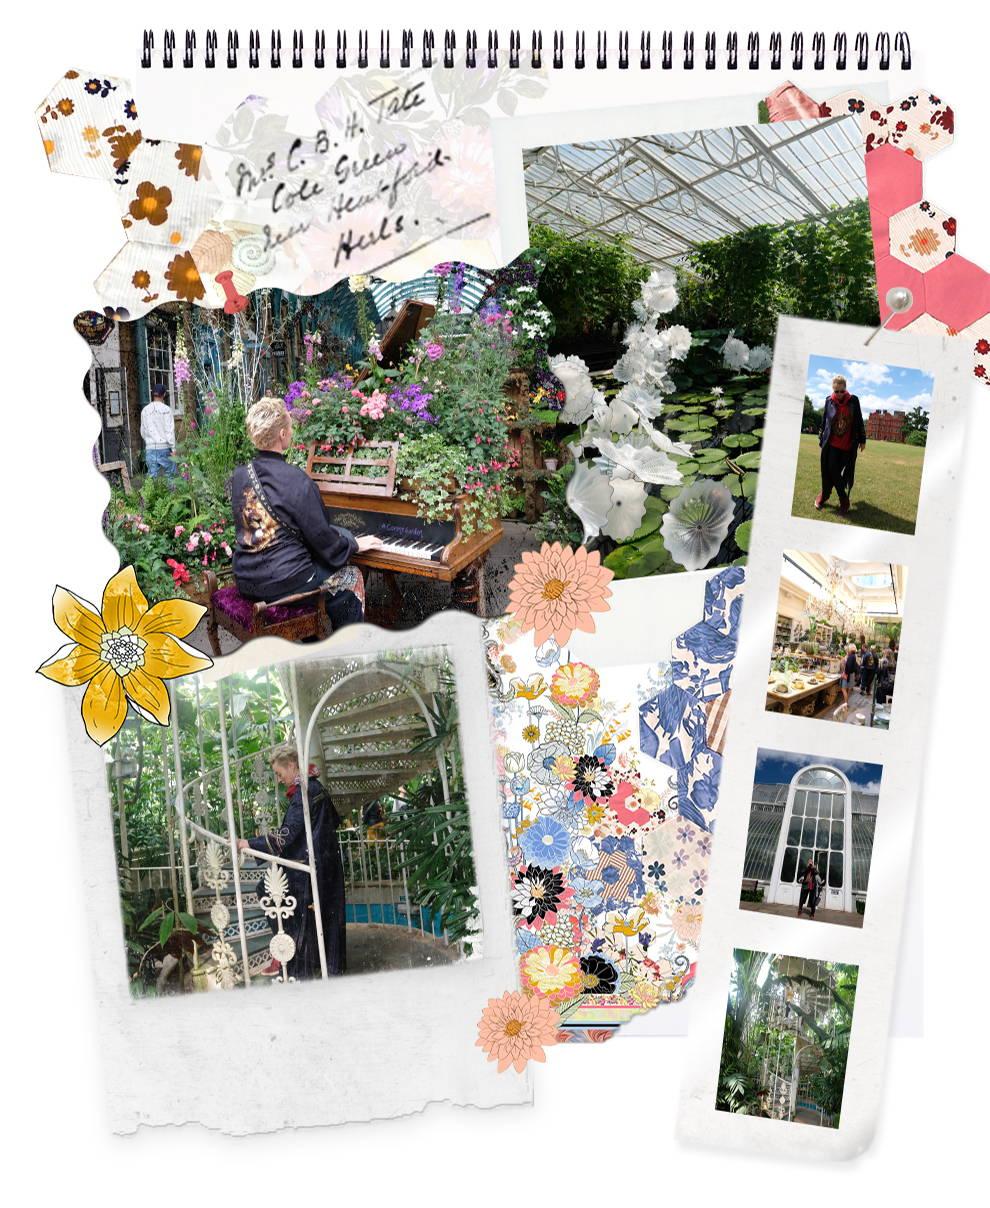 Camilla Franks travel photos from England